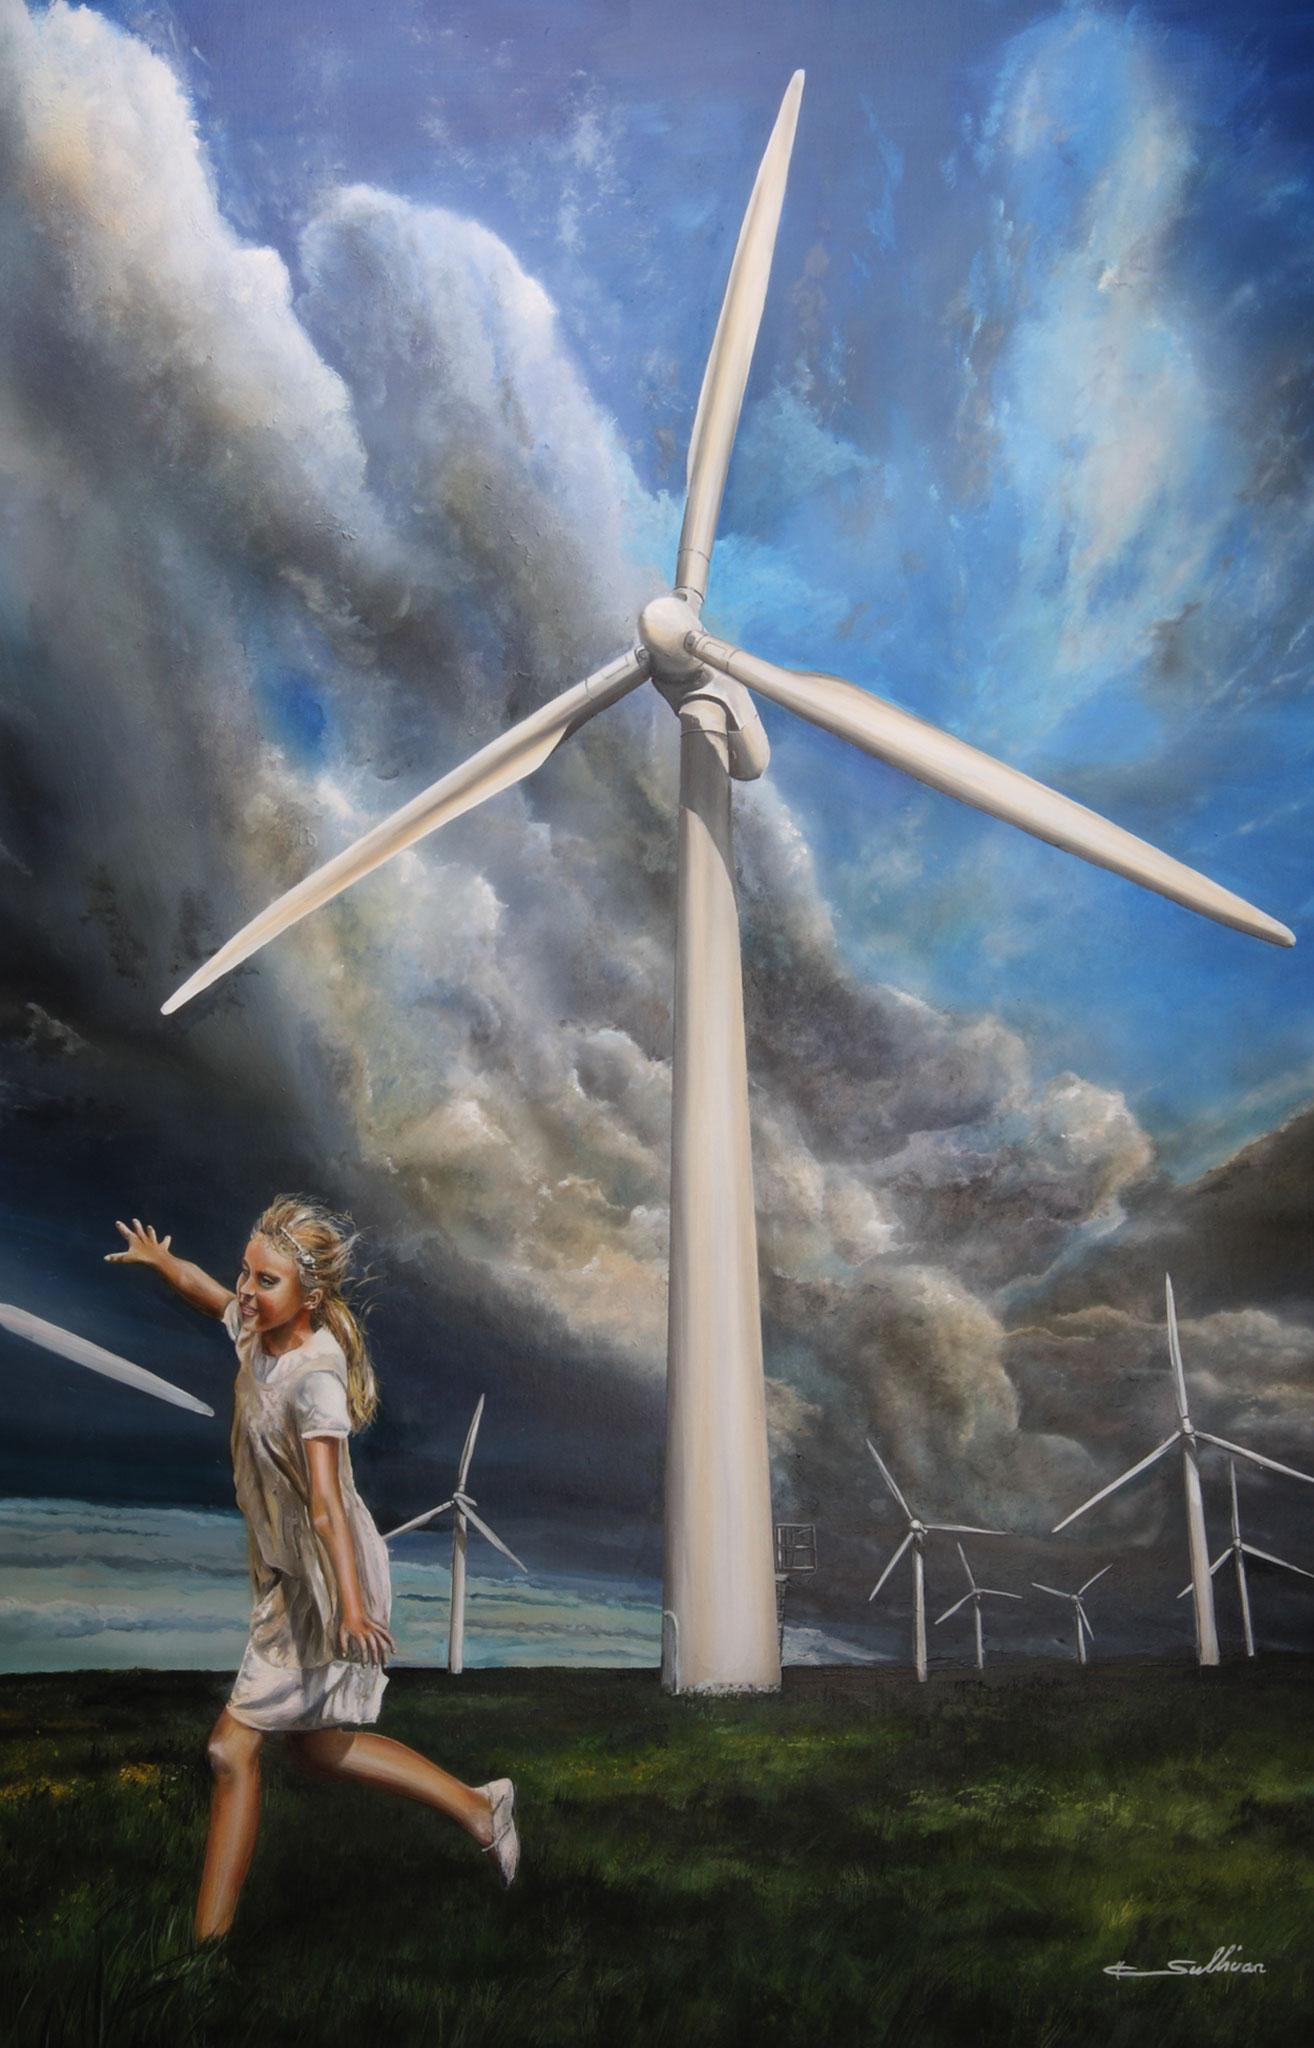 Sullivan_WindFuture_VisionBluePlanet_Art